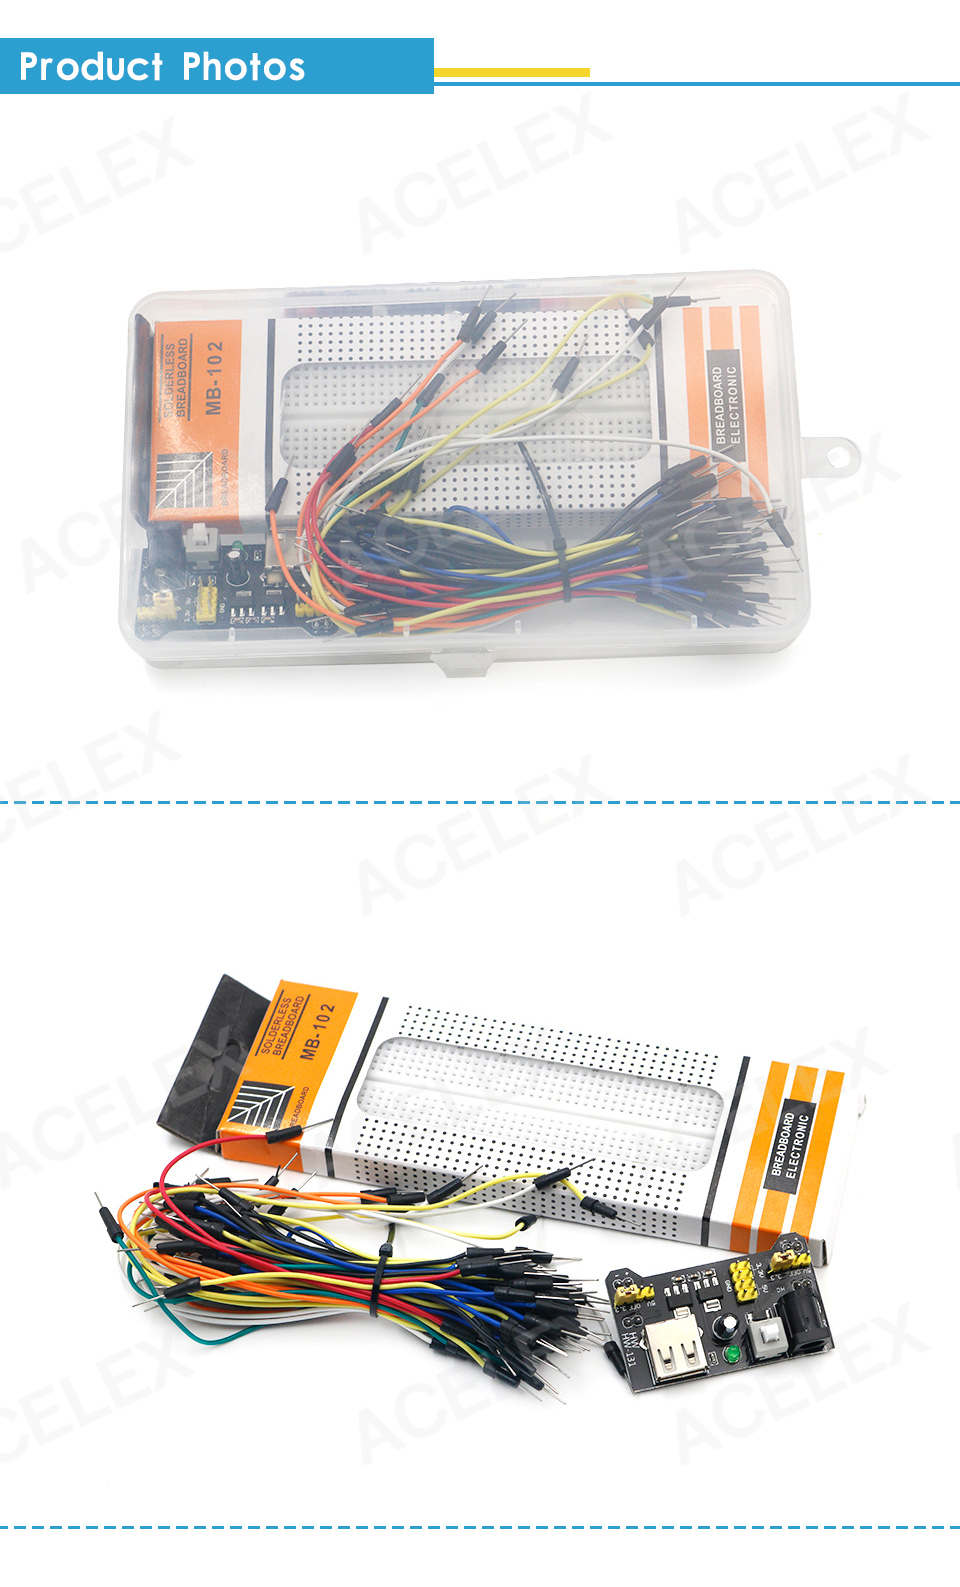 3.3V 5V MB102 Breadboard power module +